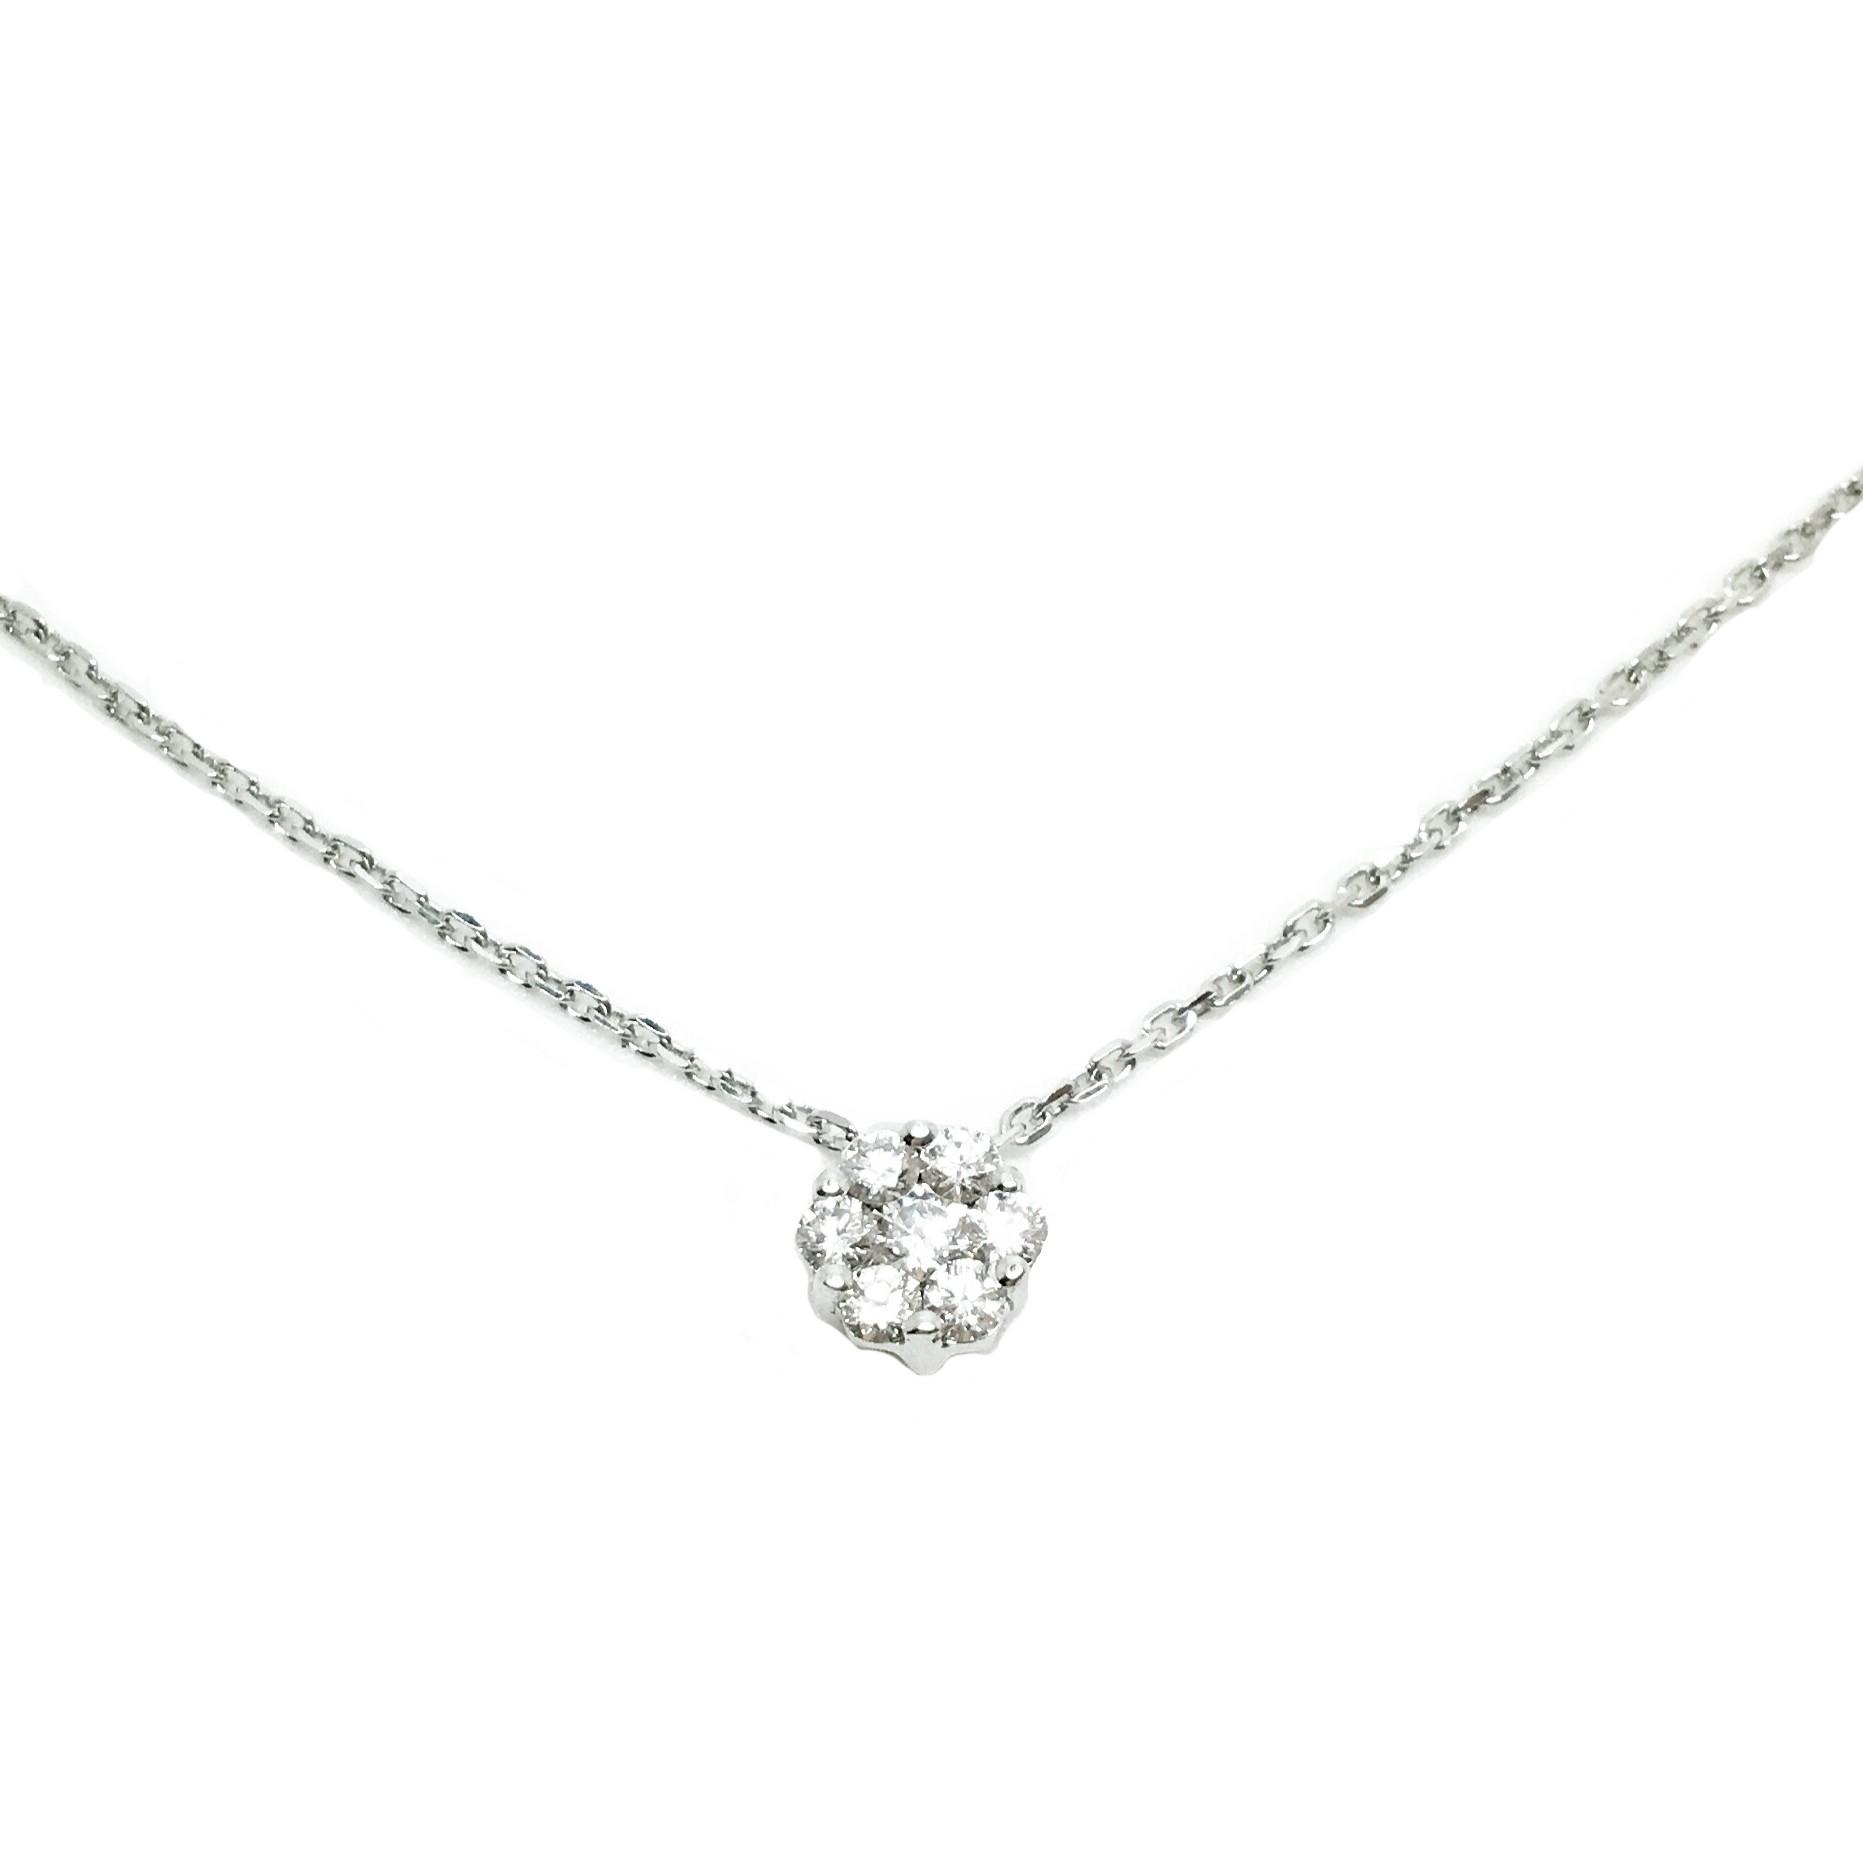 bfd8909edc68 Gargantillas de oro blanco diamante letra A joyería juan luis larráyoz  pamplona